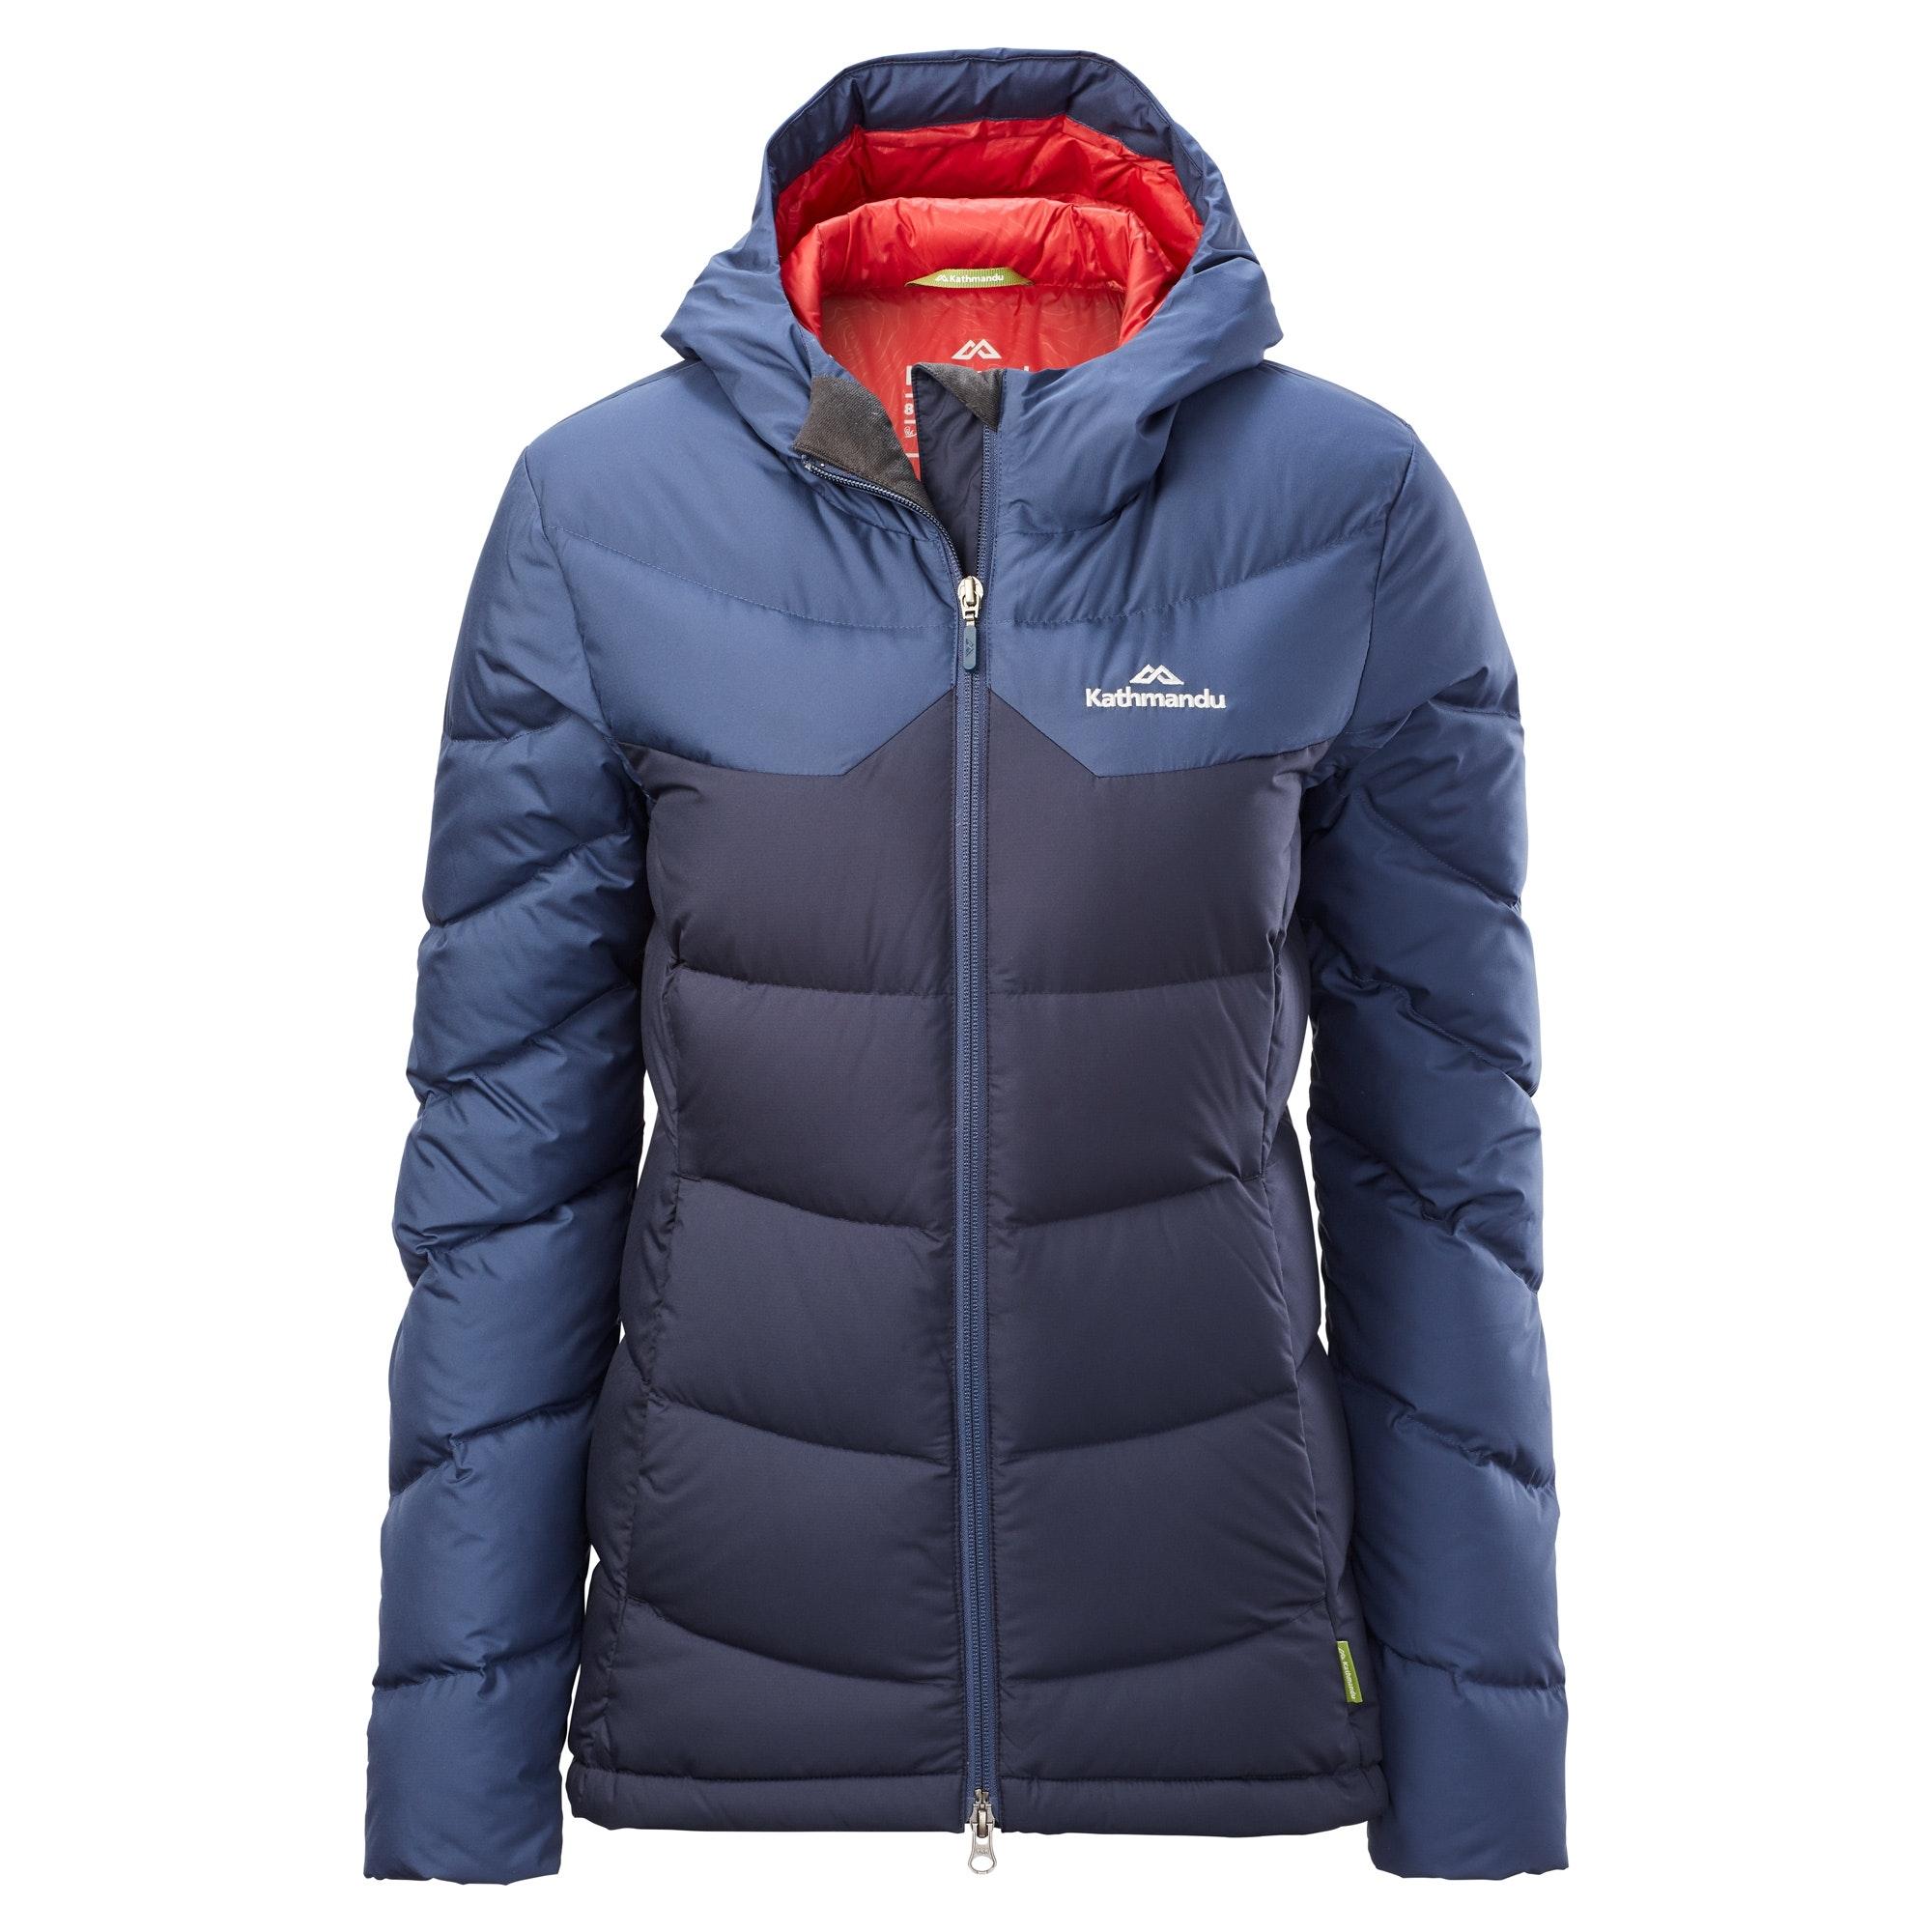 Kathmandu-Epiq-Women-039-s-Hooded-Warm-Winter-Duck-Down-Puffer-Jacket